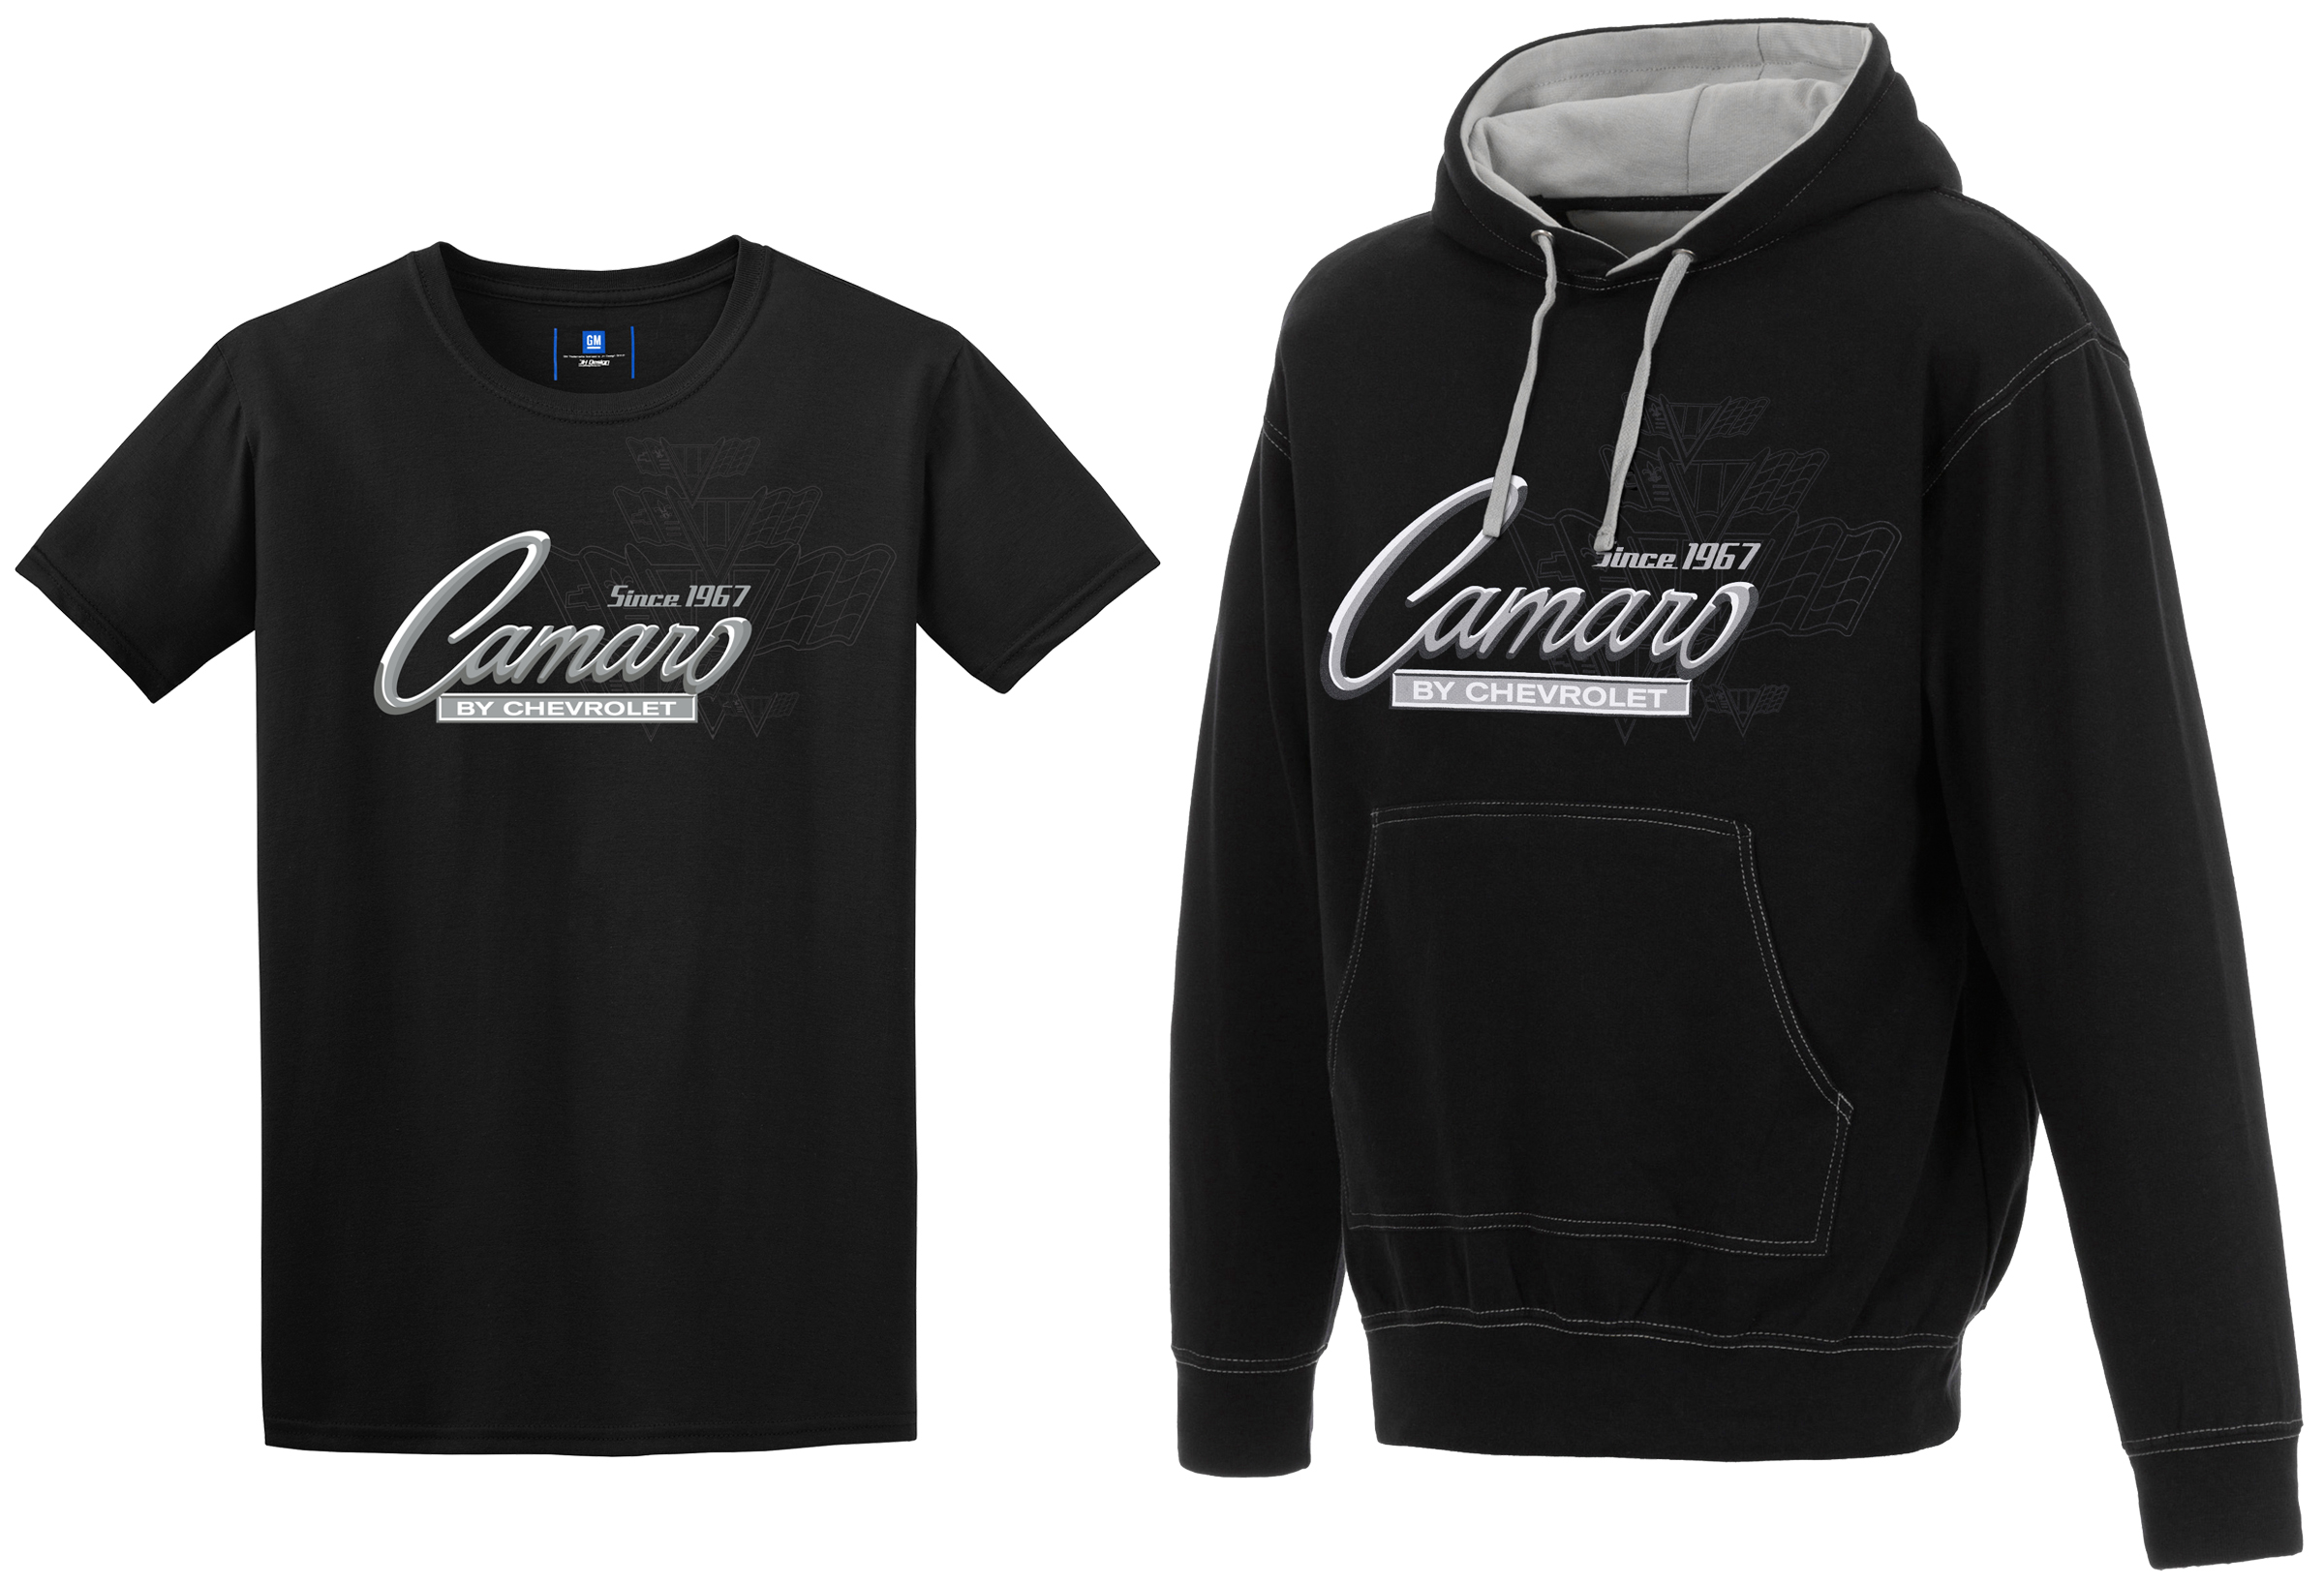 Camaro 38101930-$P West Coast Corvette Mens Corvette 60th Anniversary 427 Tee Shirt West Coast Corvette